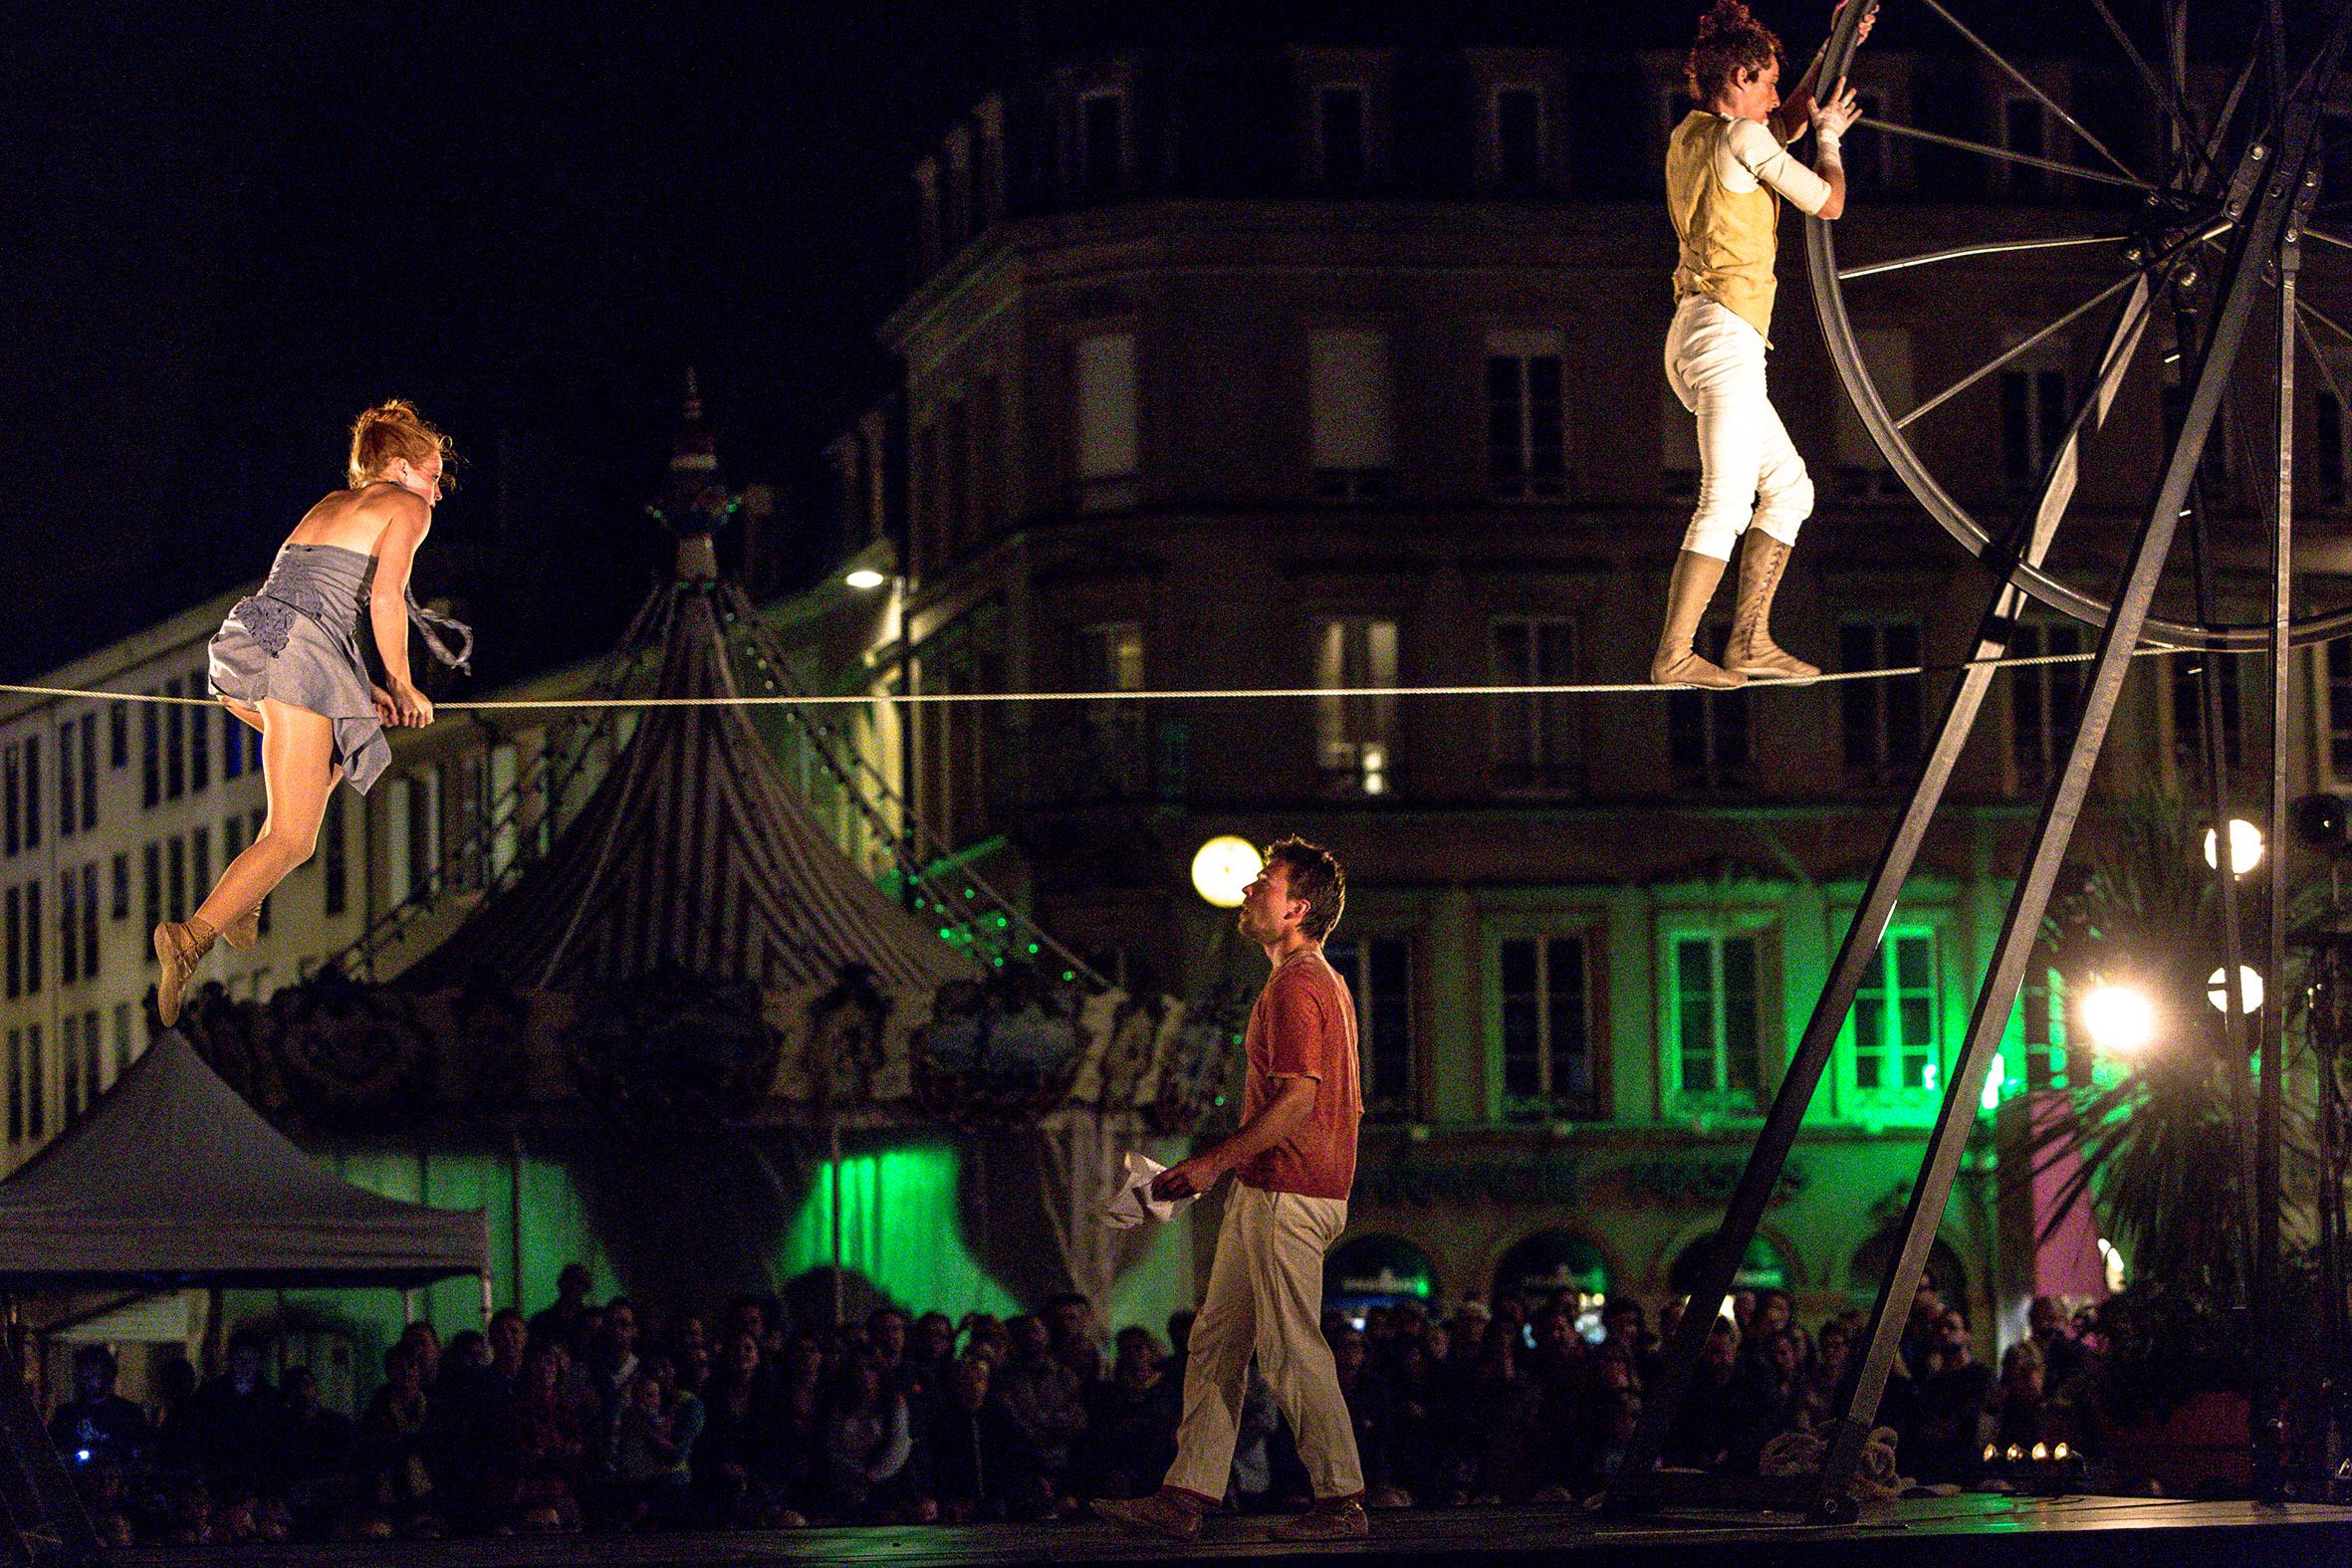 spectacles-sodade-cirque-rouage-mirabelle-metz-2015-marie-colette-becker-11